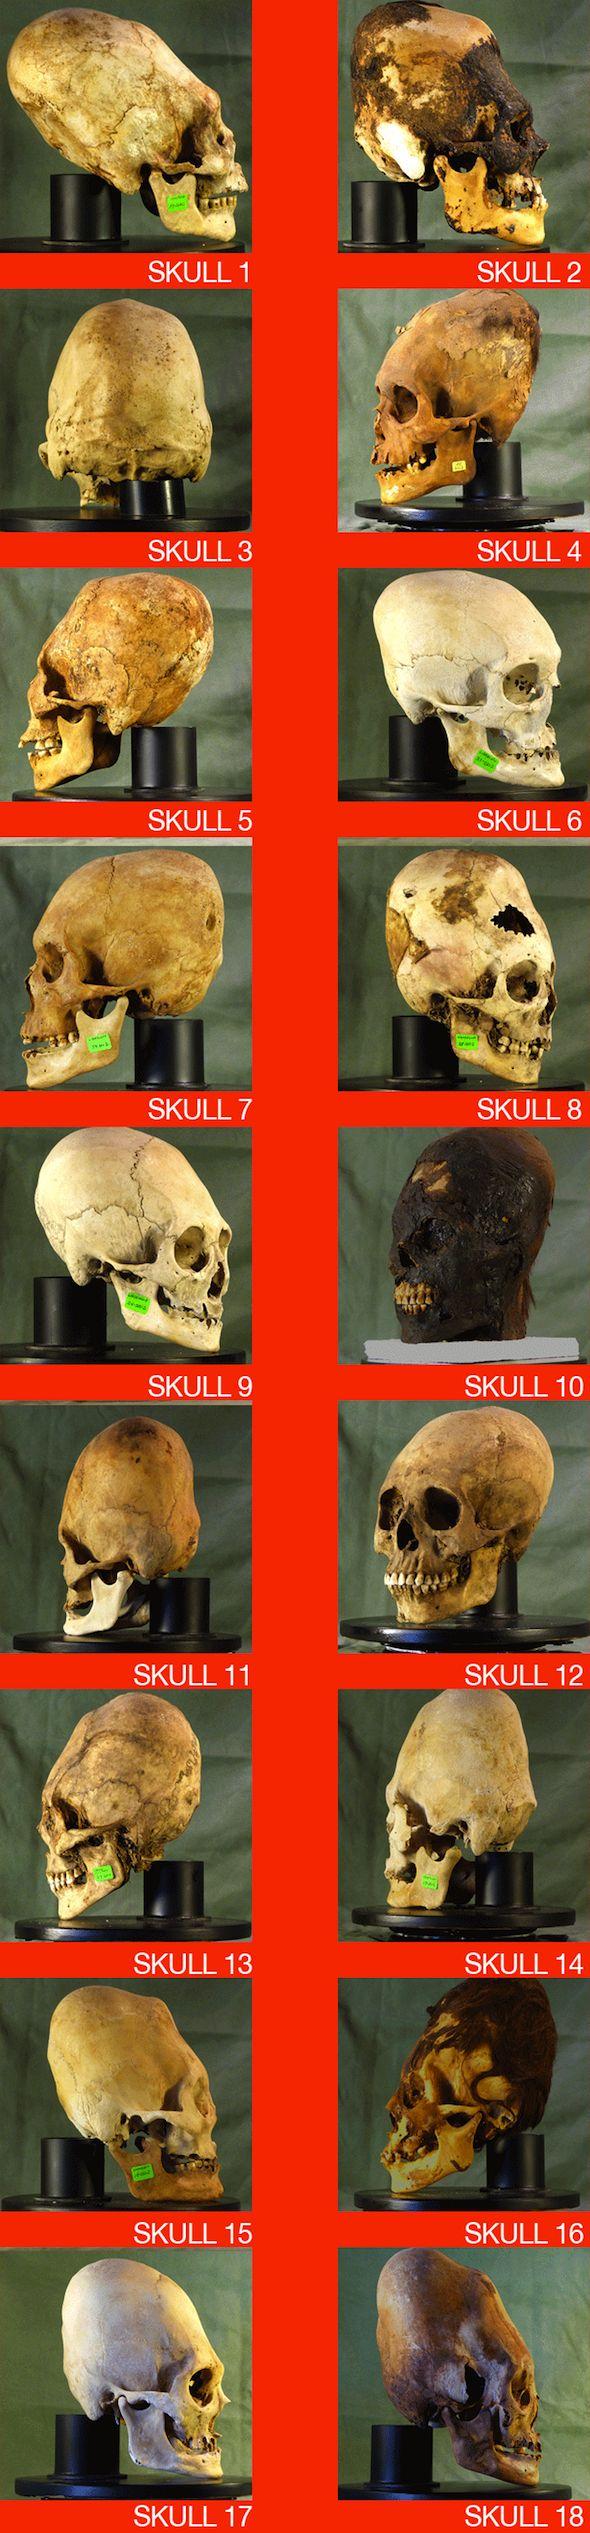 18 Elongated Skulls of Paracas Peru [VIDEO]   Raising Miro on the Road of Life - Travel Podcast